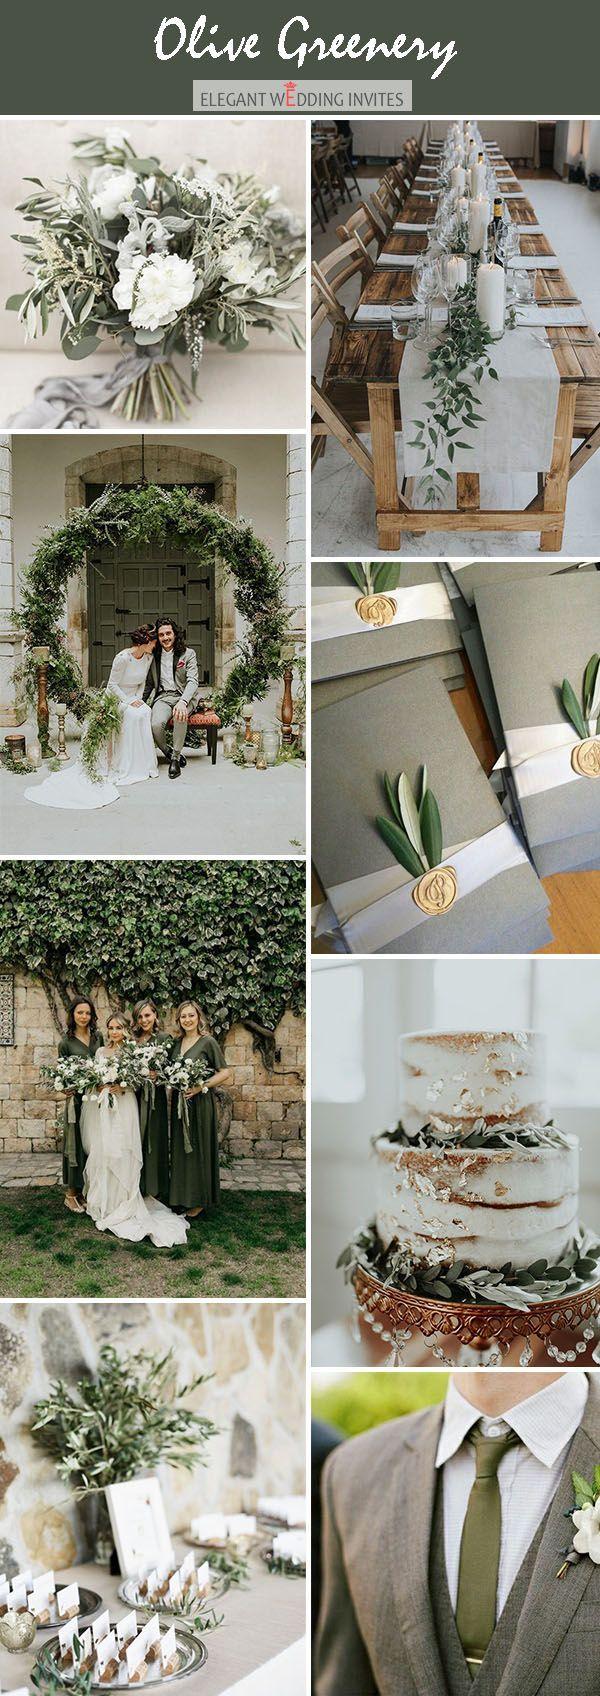 Olive green moody wedding color palete ideas #weddingideas